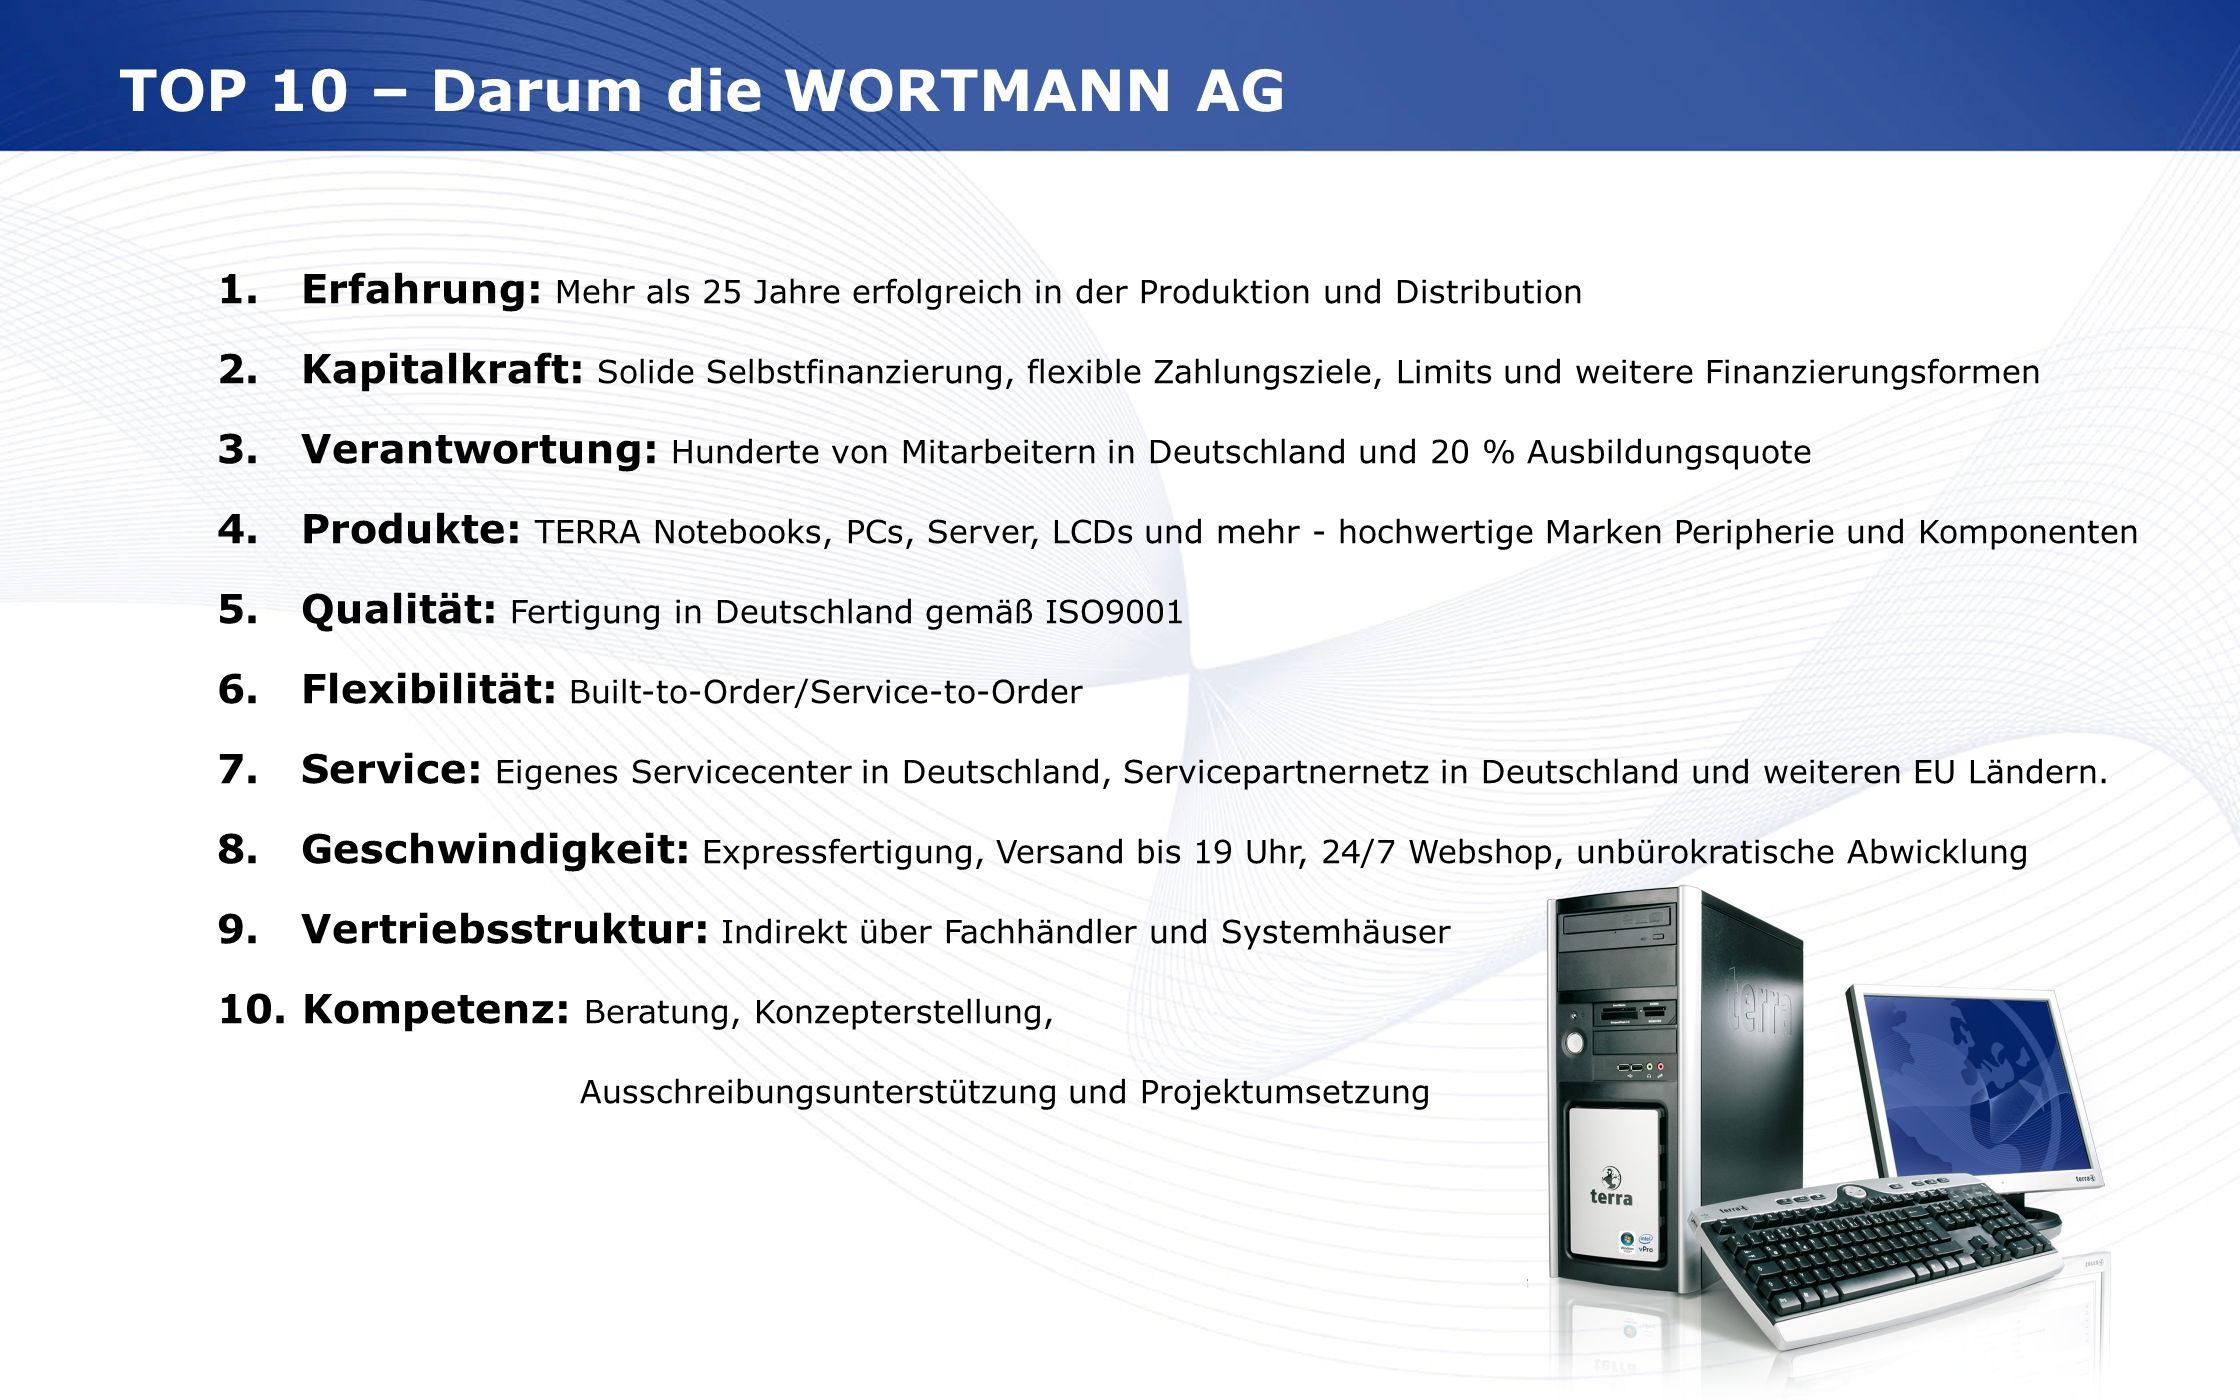 www.wortmann.de TERRA PC POSITIONIERUNG MOBILE PC LCD SERVER STORAGE FIREWALL THINCLIENT SERVICE